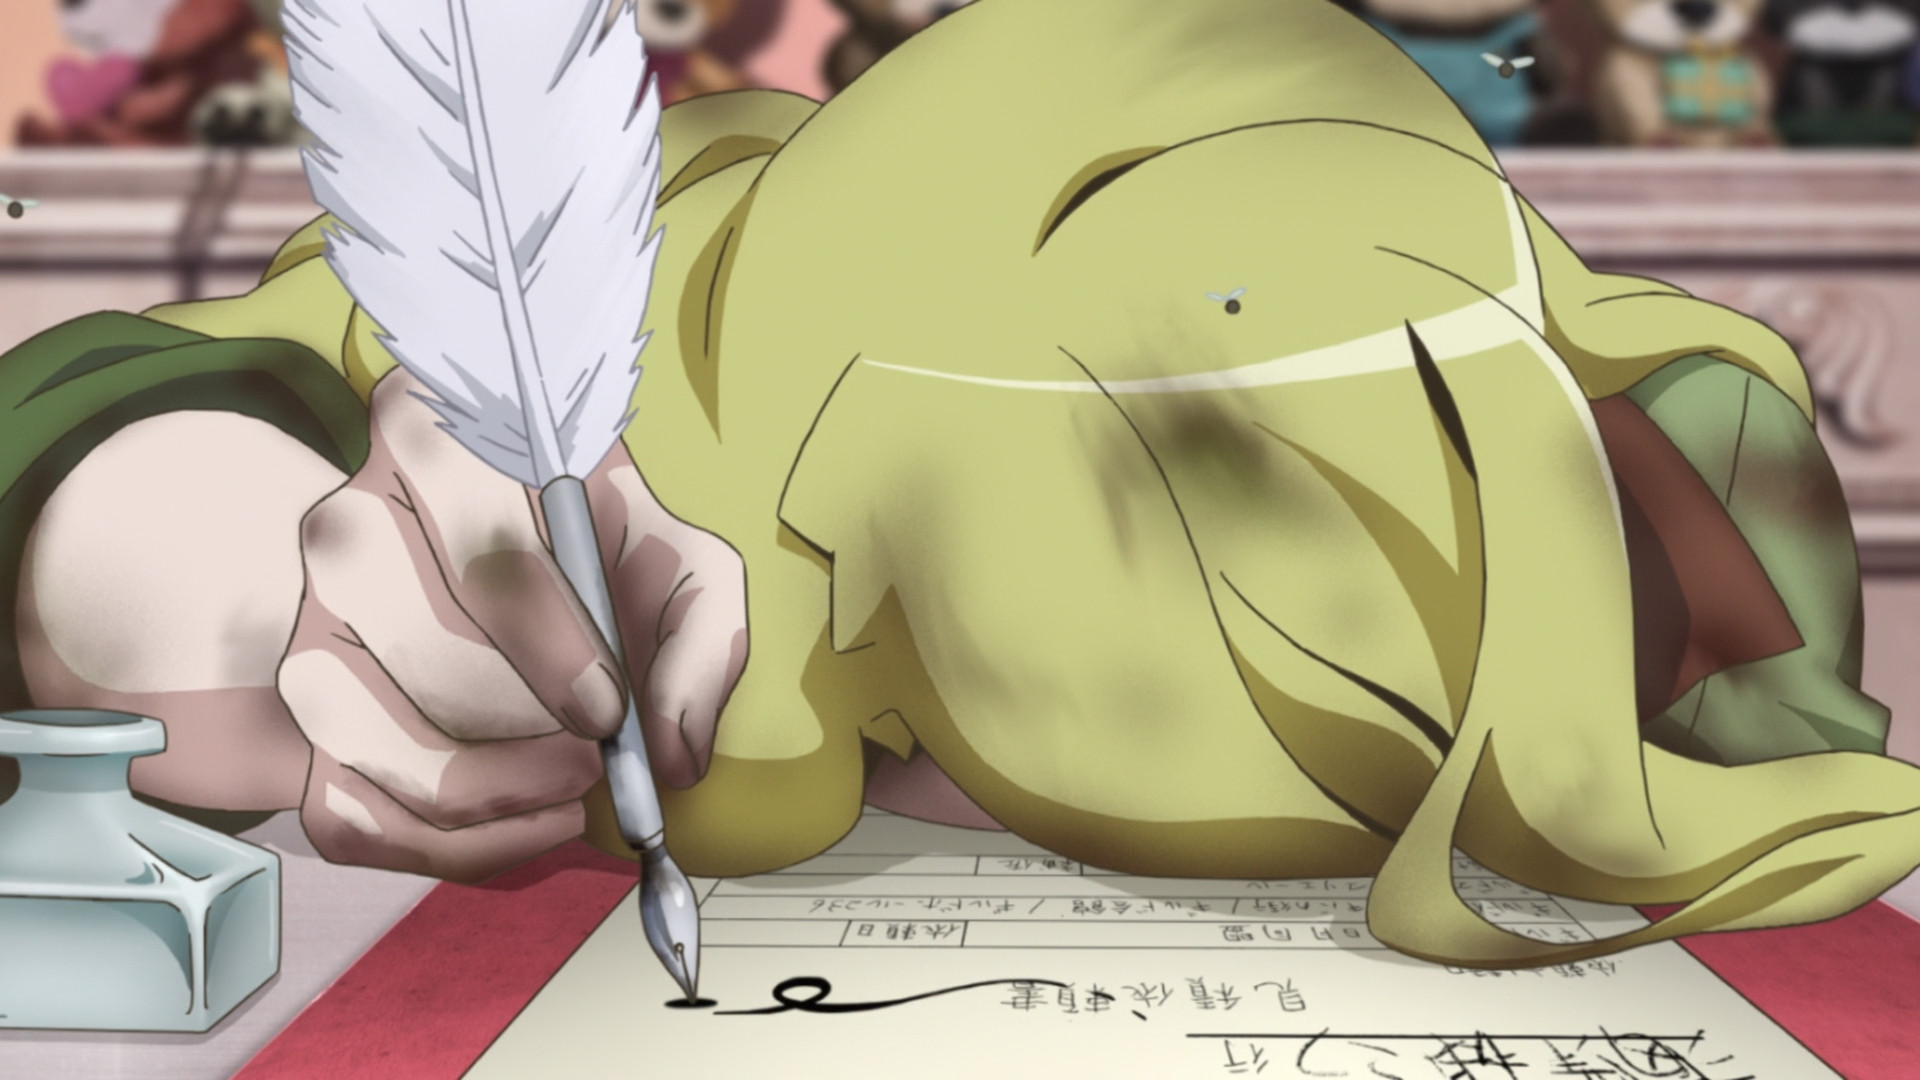 Anime – Log Horizon Maryelle (Log Horizon) Wallpaper